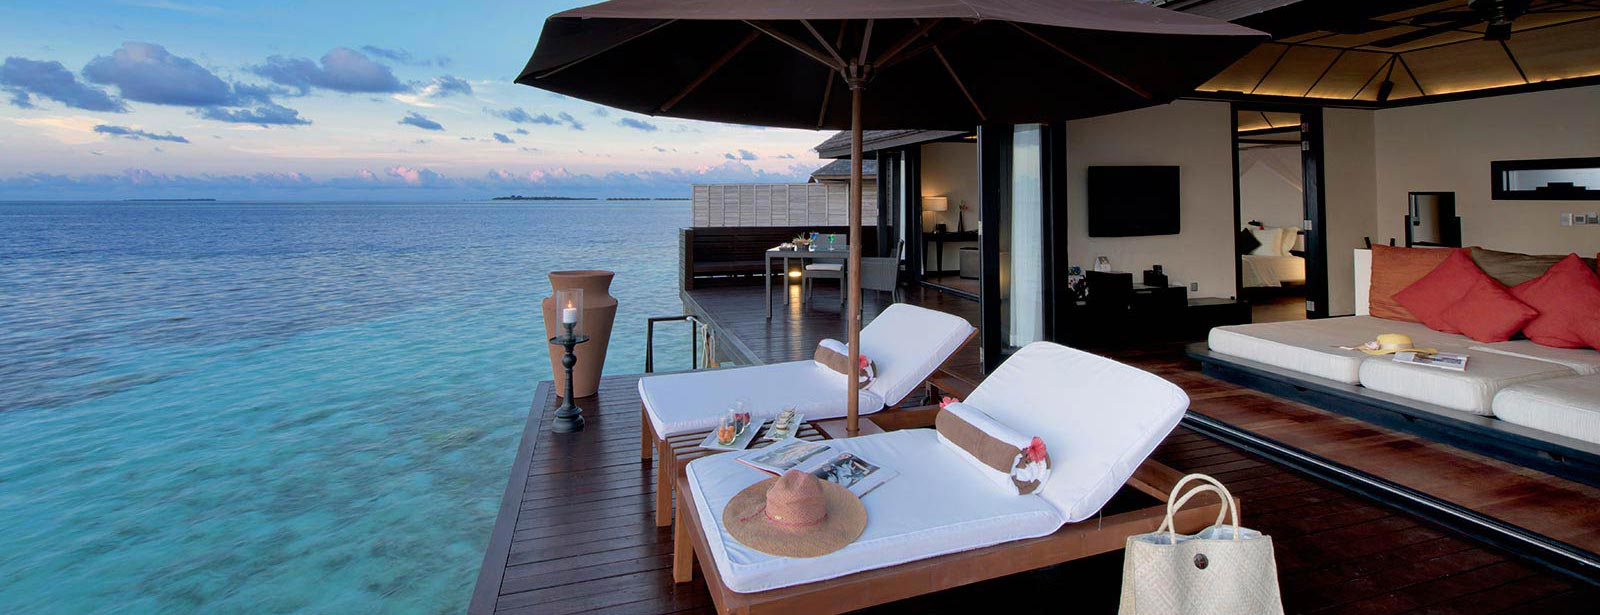 Maldives Private Beach Villa The Best Beaches In World